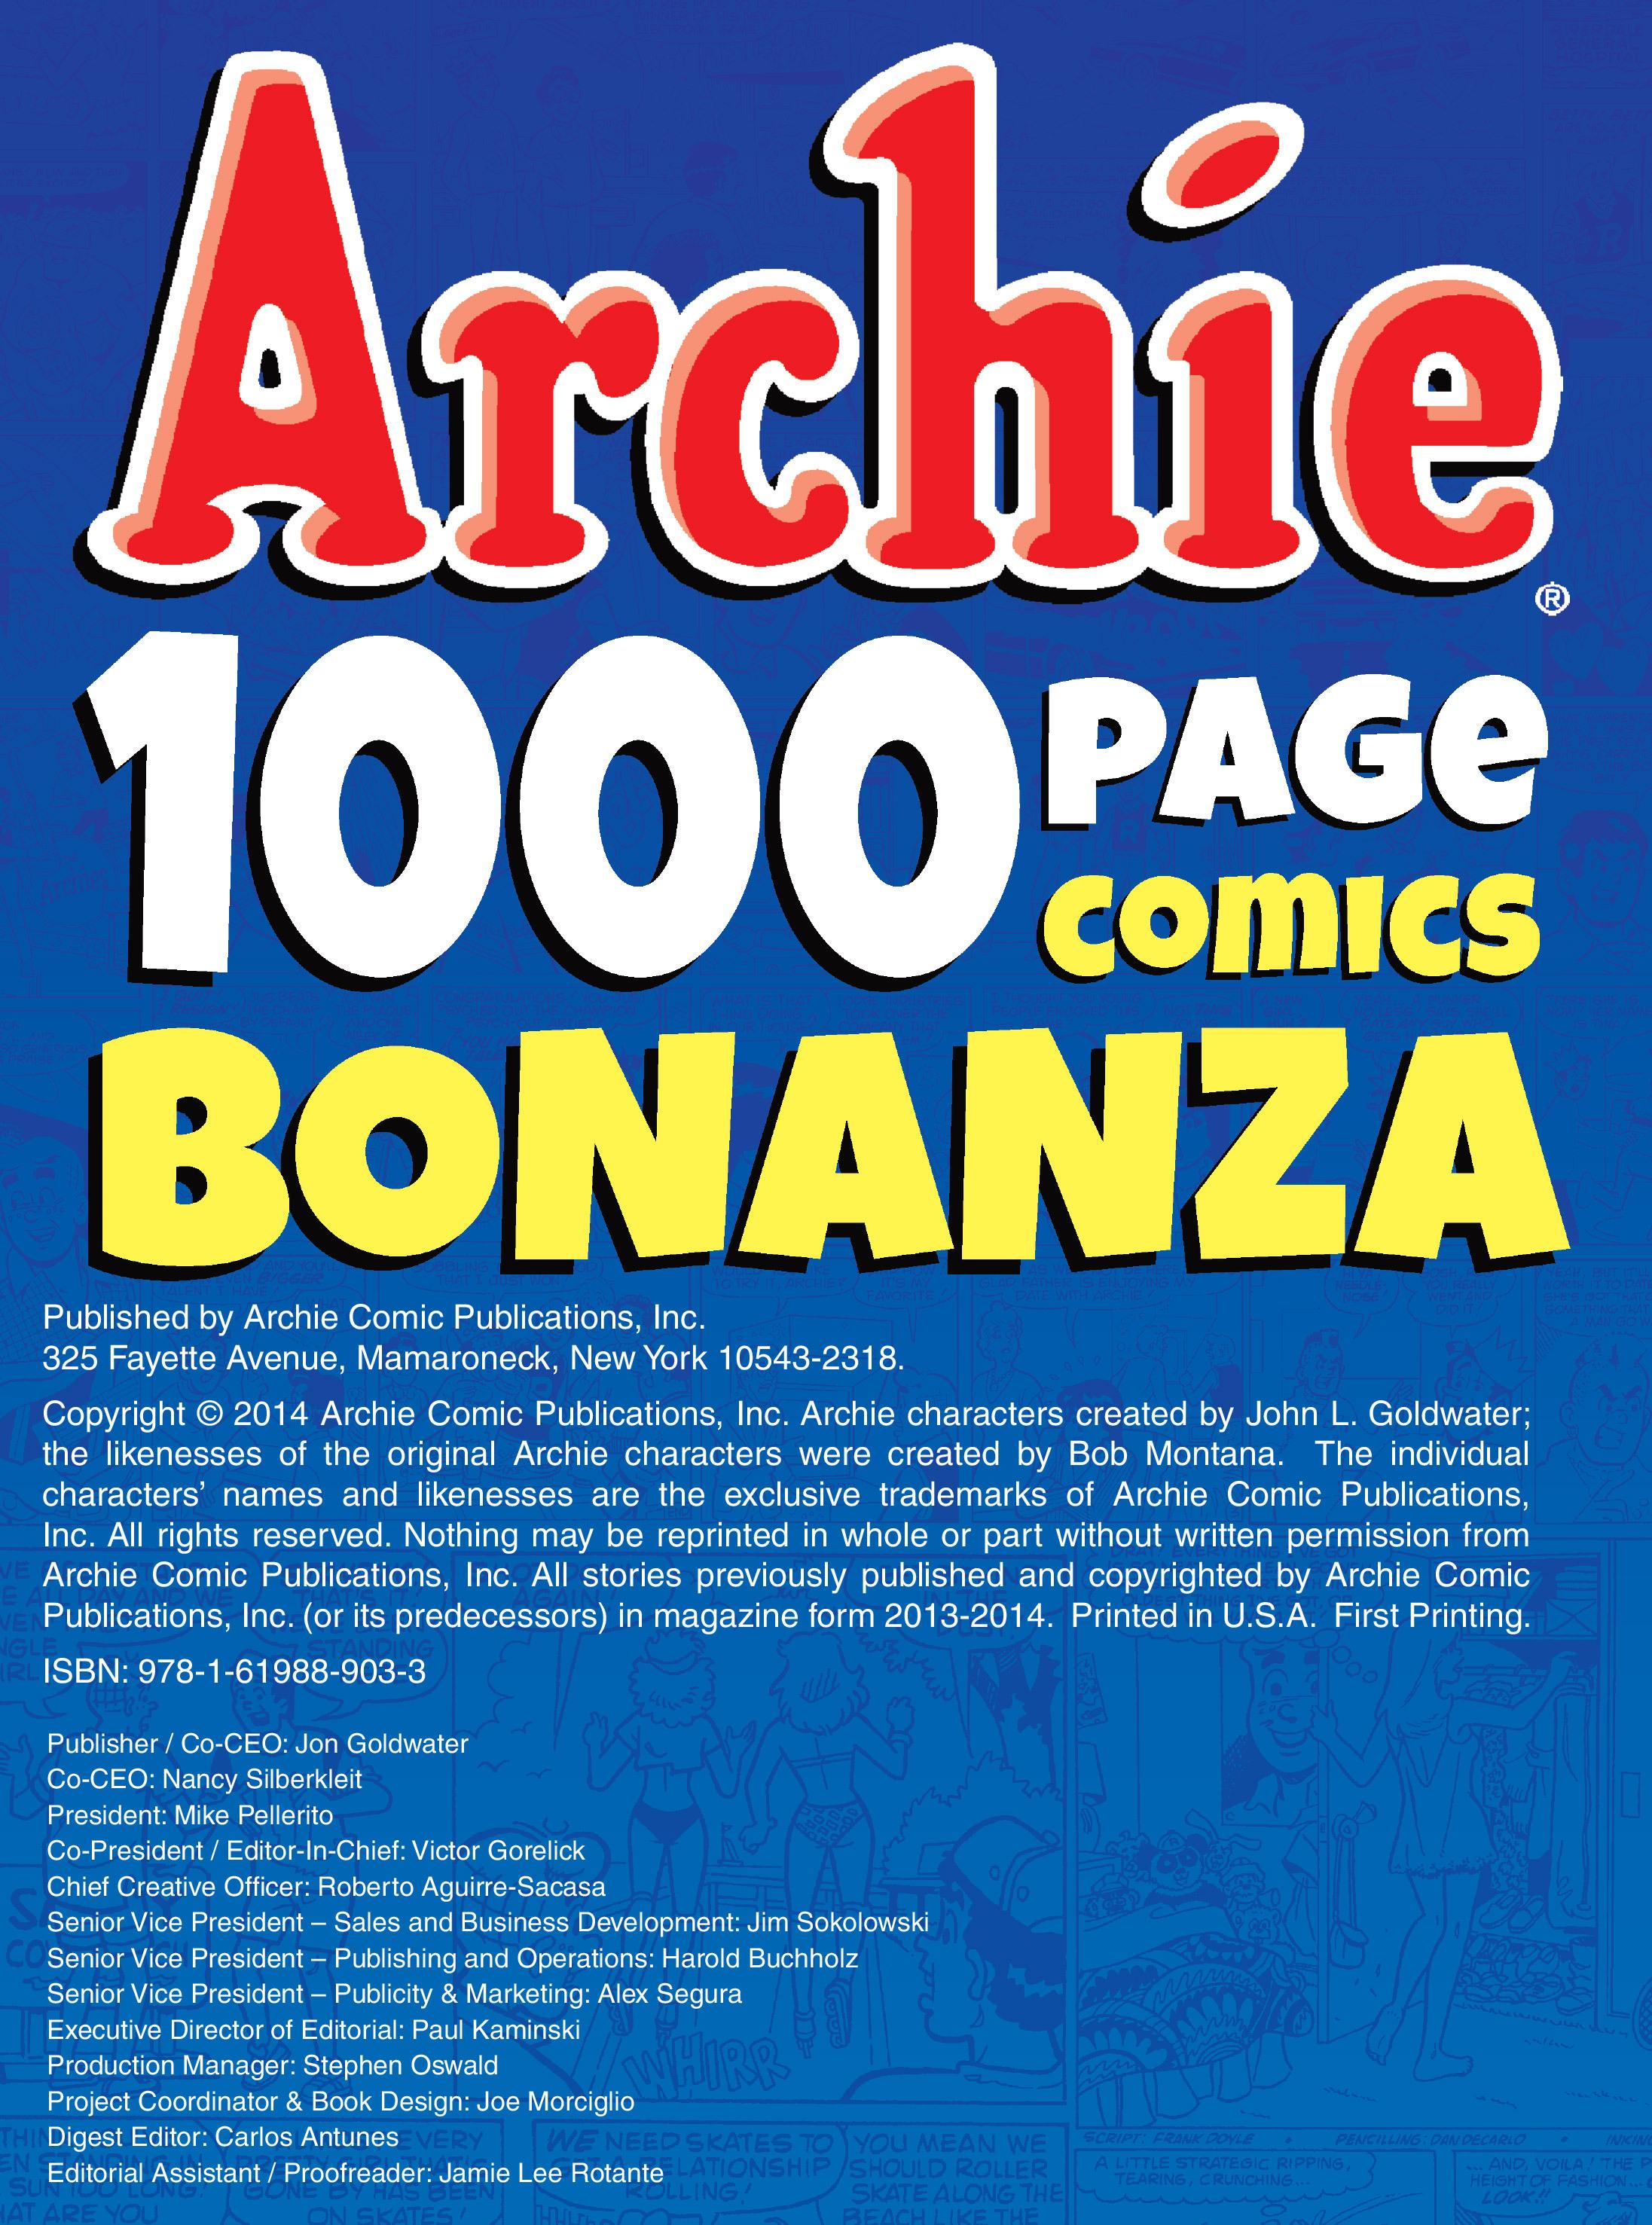 Read online Archie 1000 Page Comics Bonanza comic -  Issue #1 (Part 1) - 2